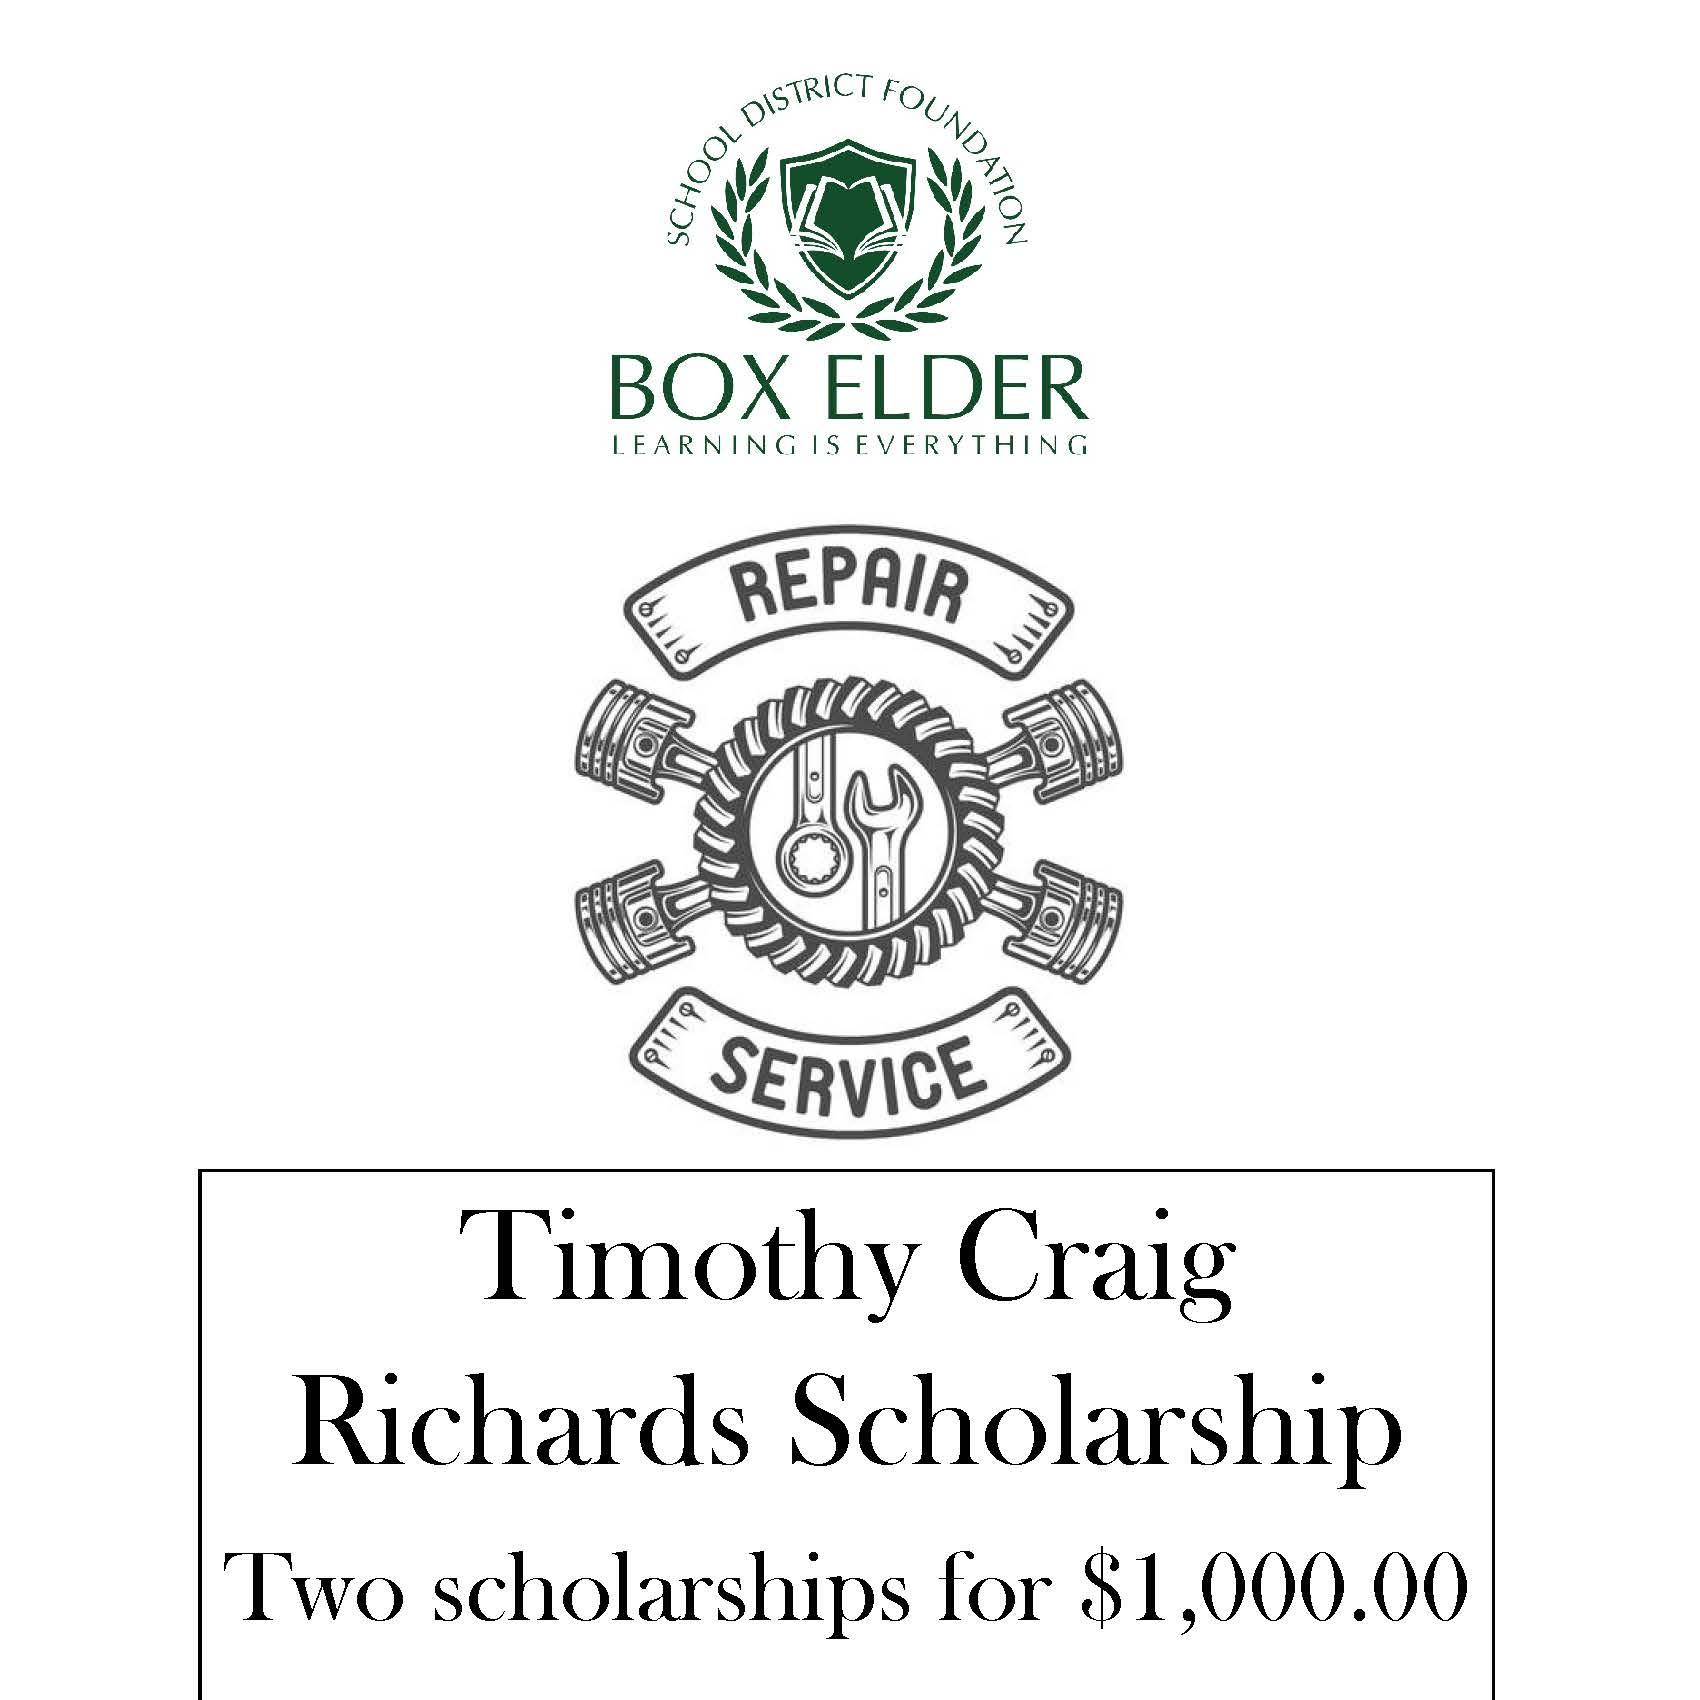 Timothy Craig Richards Scholarship